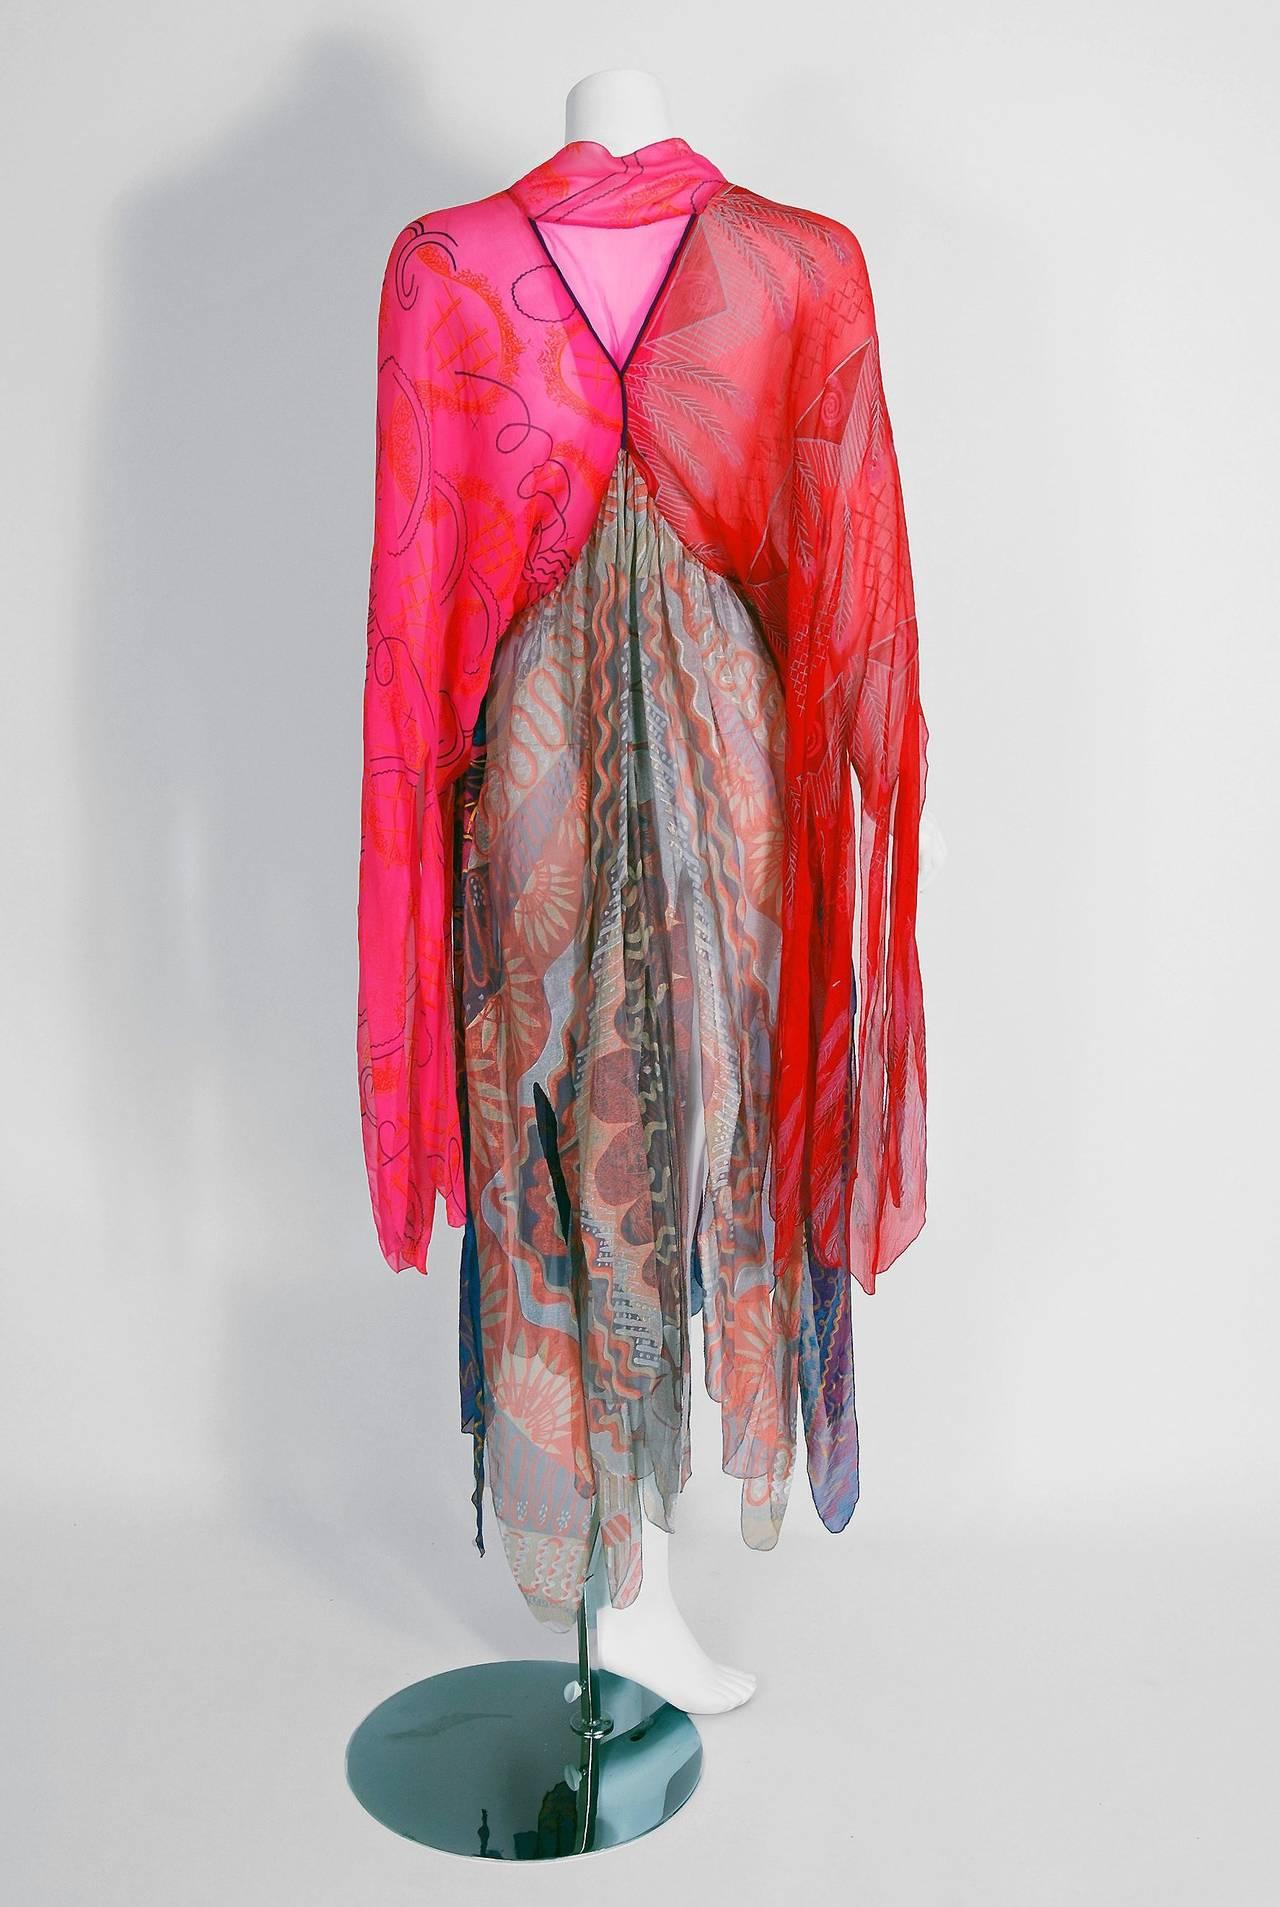 1972 Zandra Rhodes Hand-Painted Indian Feathers & Lillies Silk Caftan Dress 5